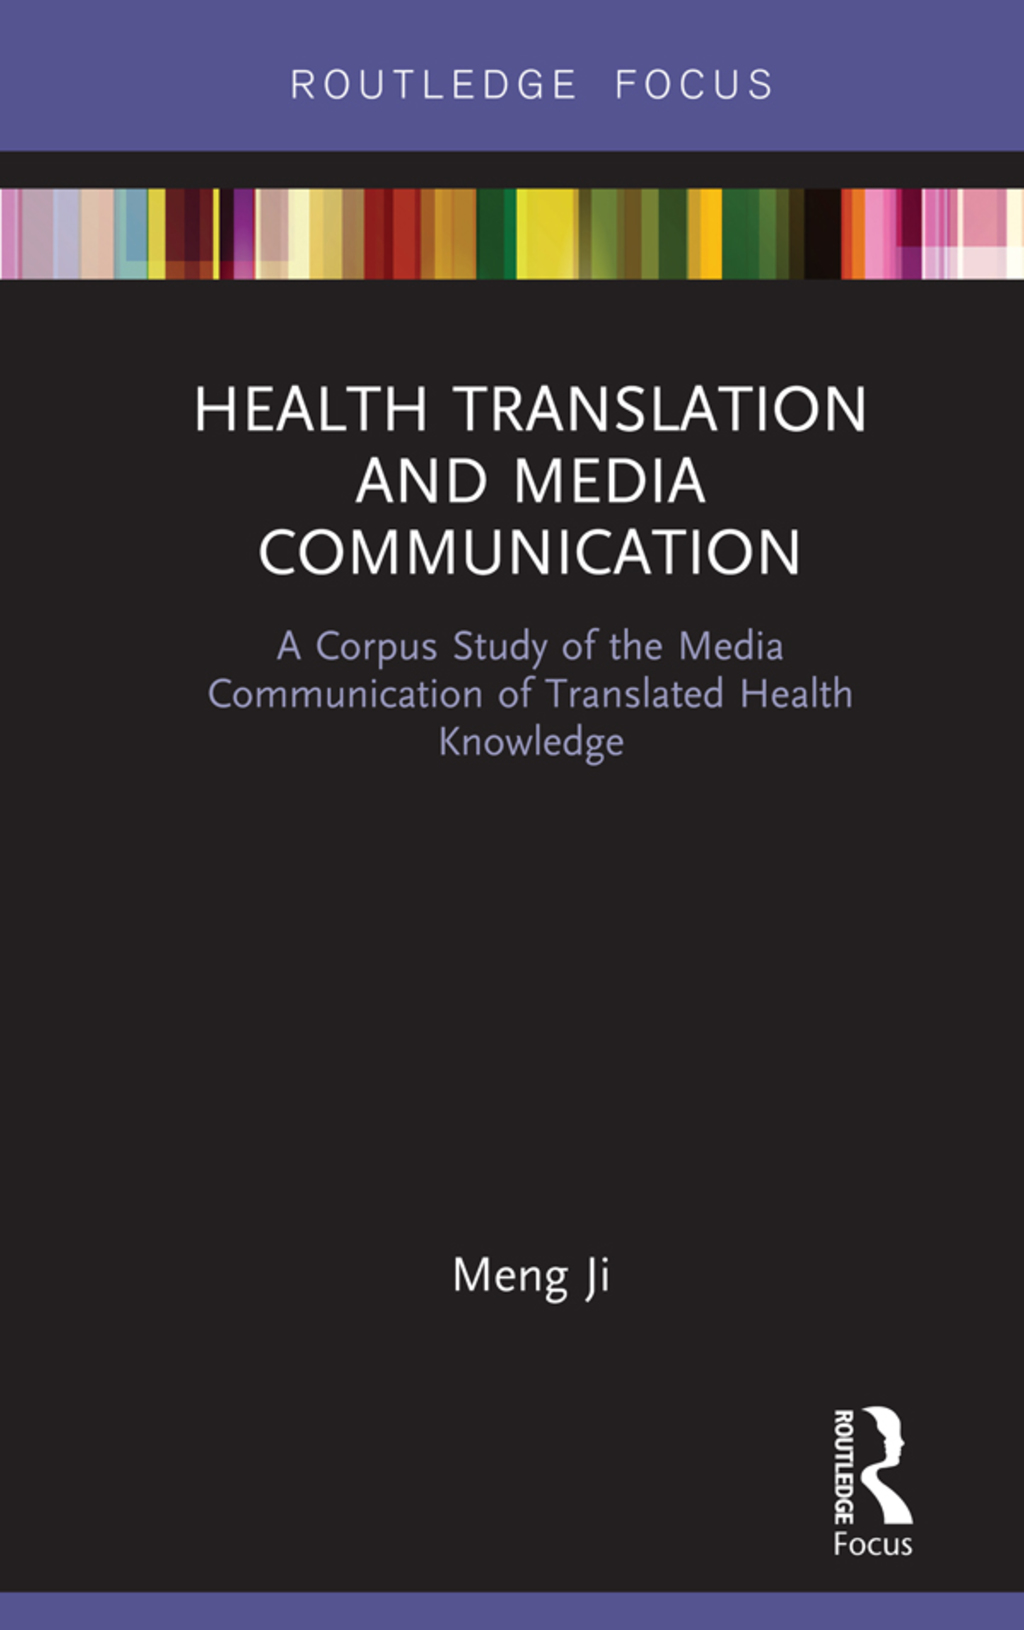 Health Translation and Media Communication (eBook Rental)